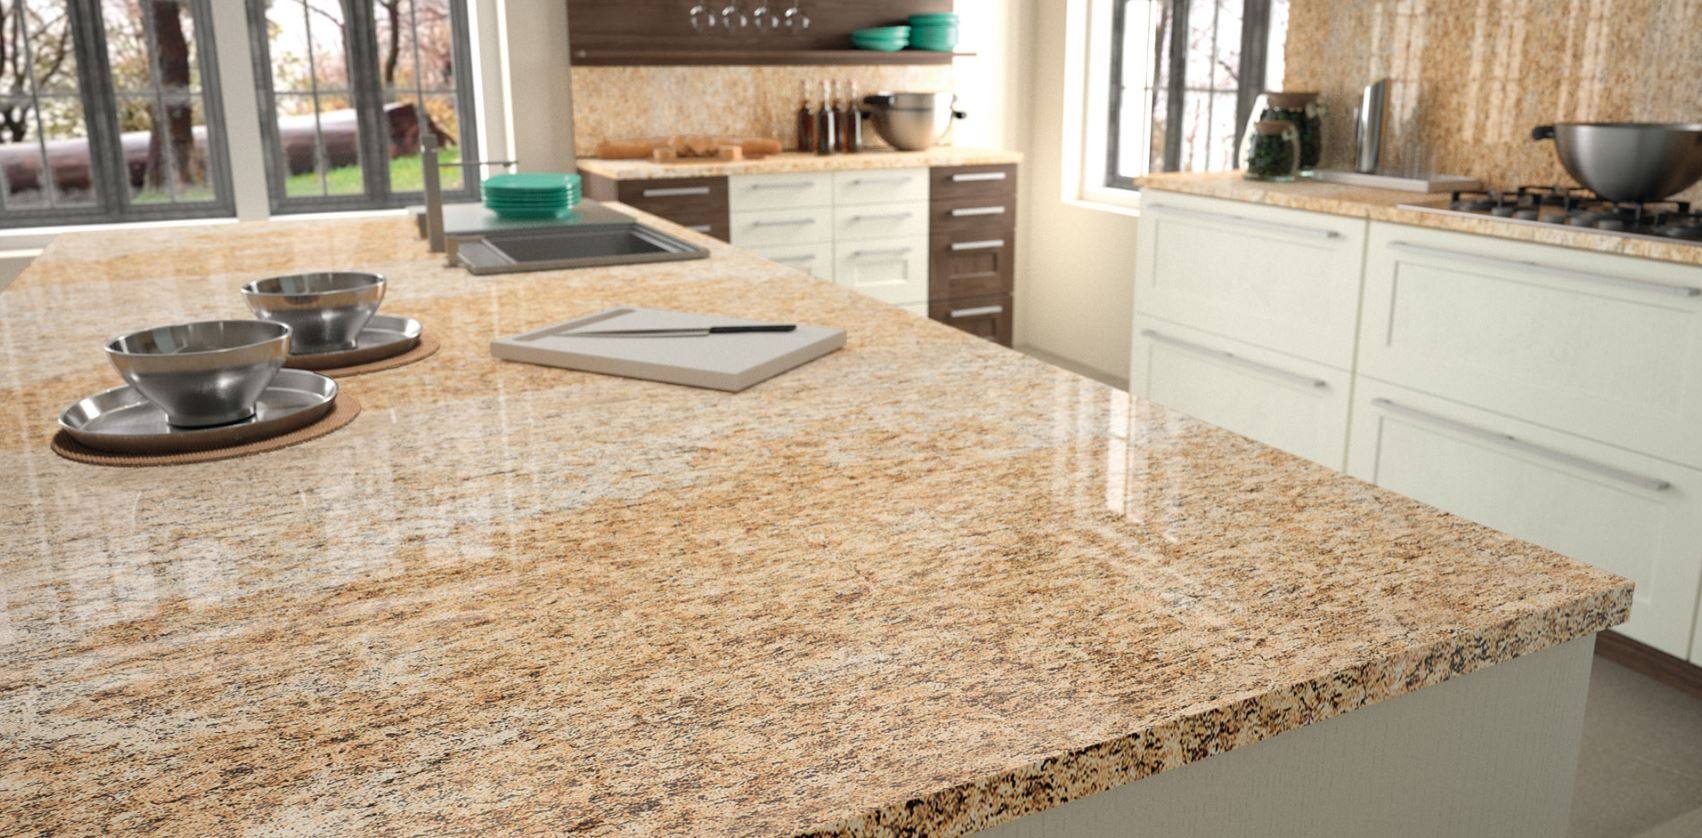 Unique Granite Slabs. Granite Countertops Available At Lumberjacku0027s  Kitchens And Baths.